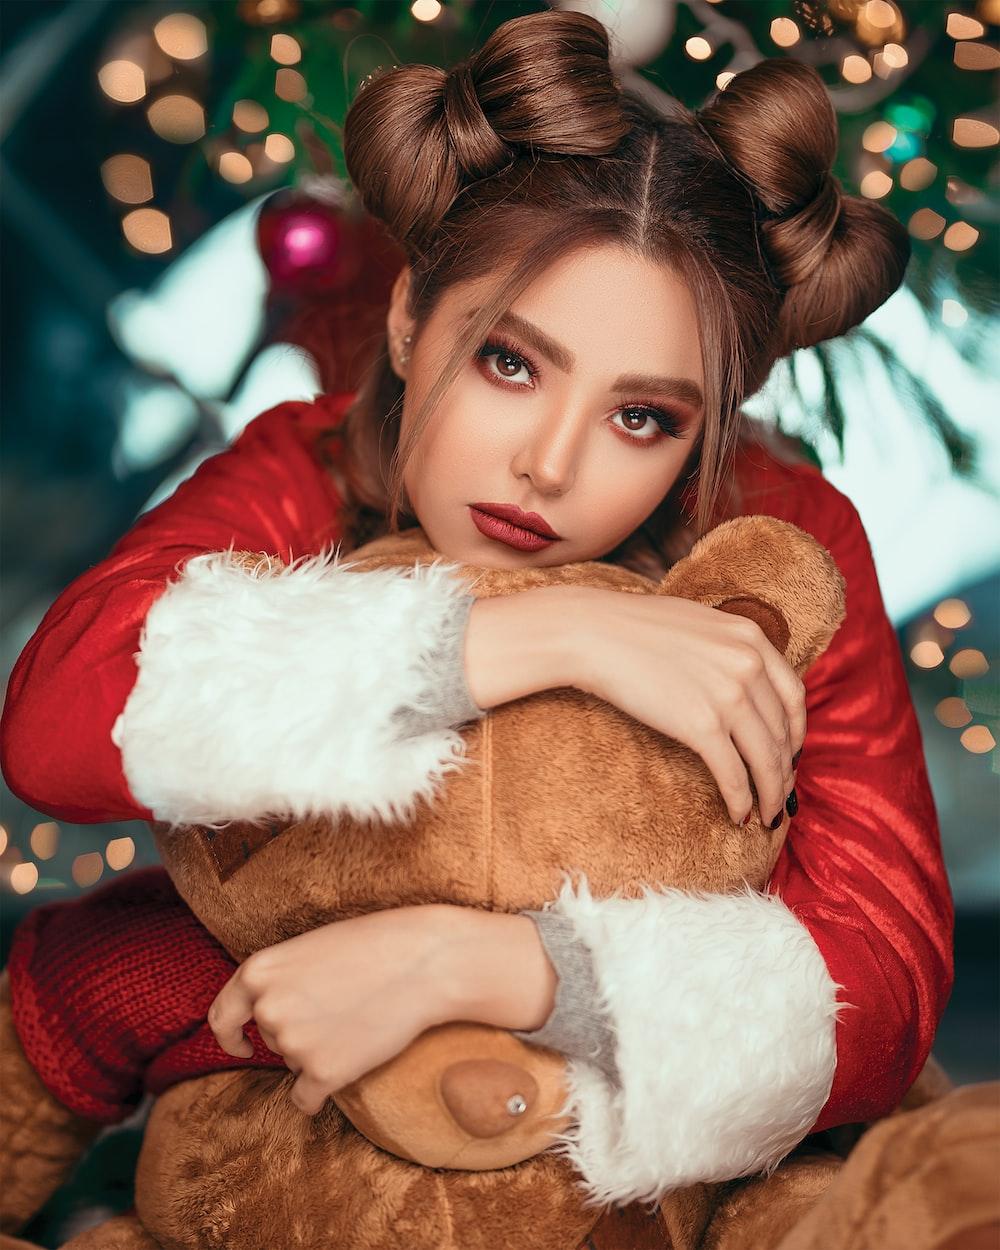 woman wearing red and white Santa costume hugging brown bear plush toy